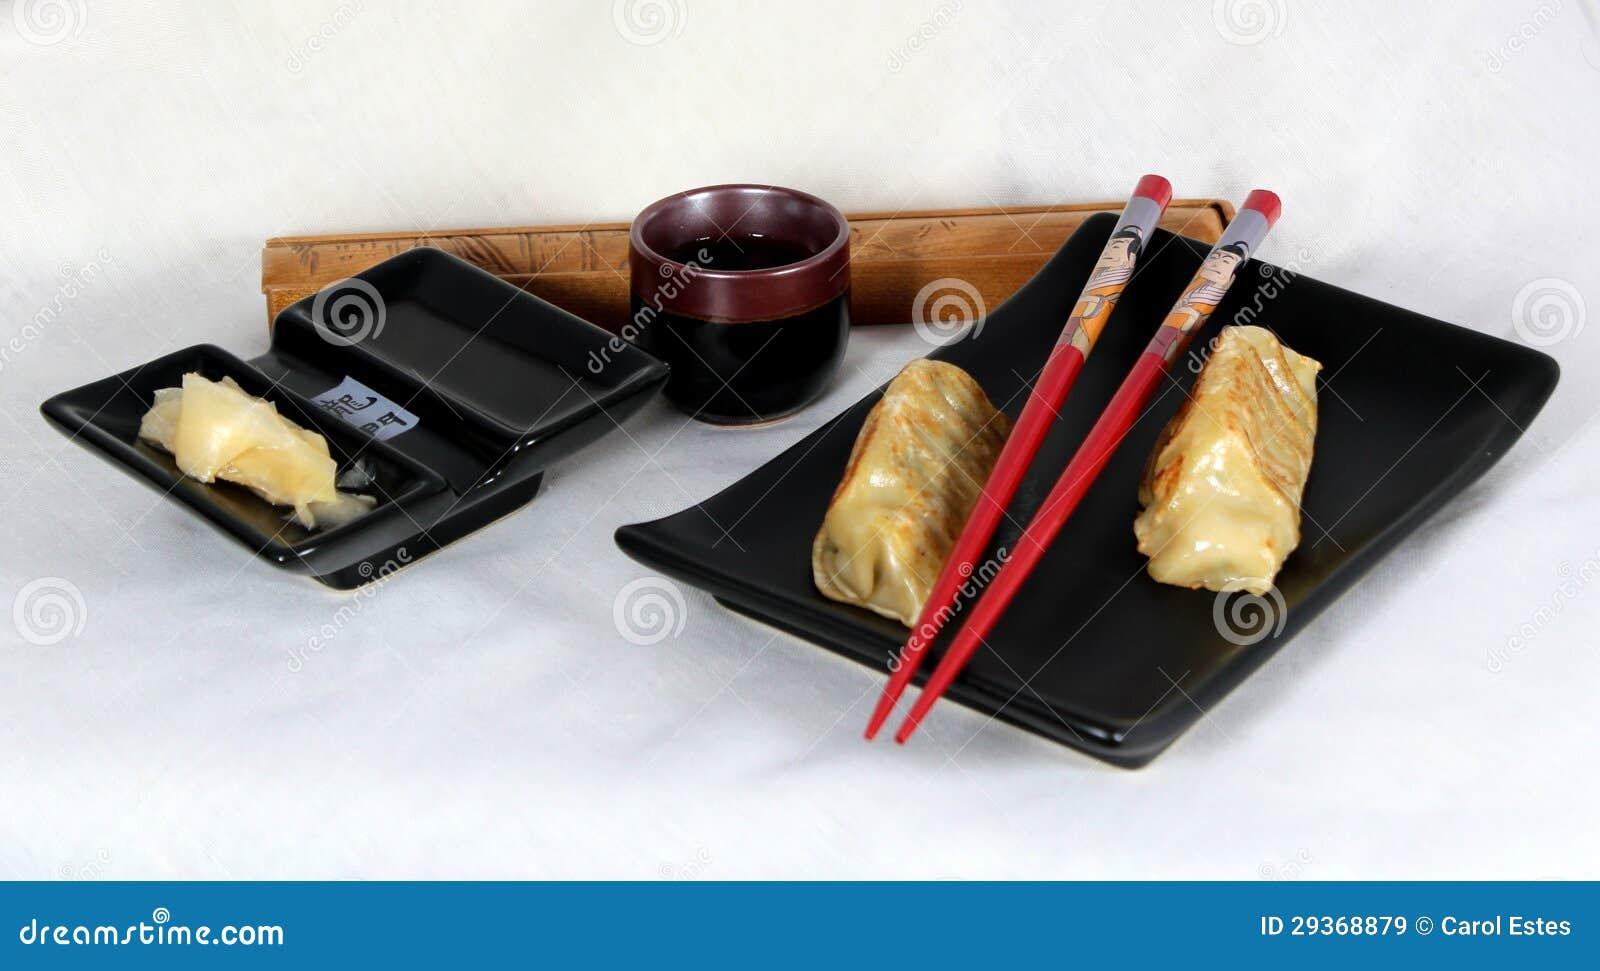 Japanse potstickers met gember, soja en belang.